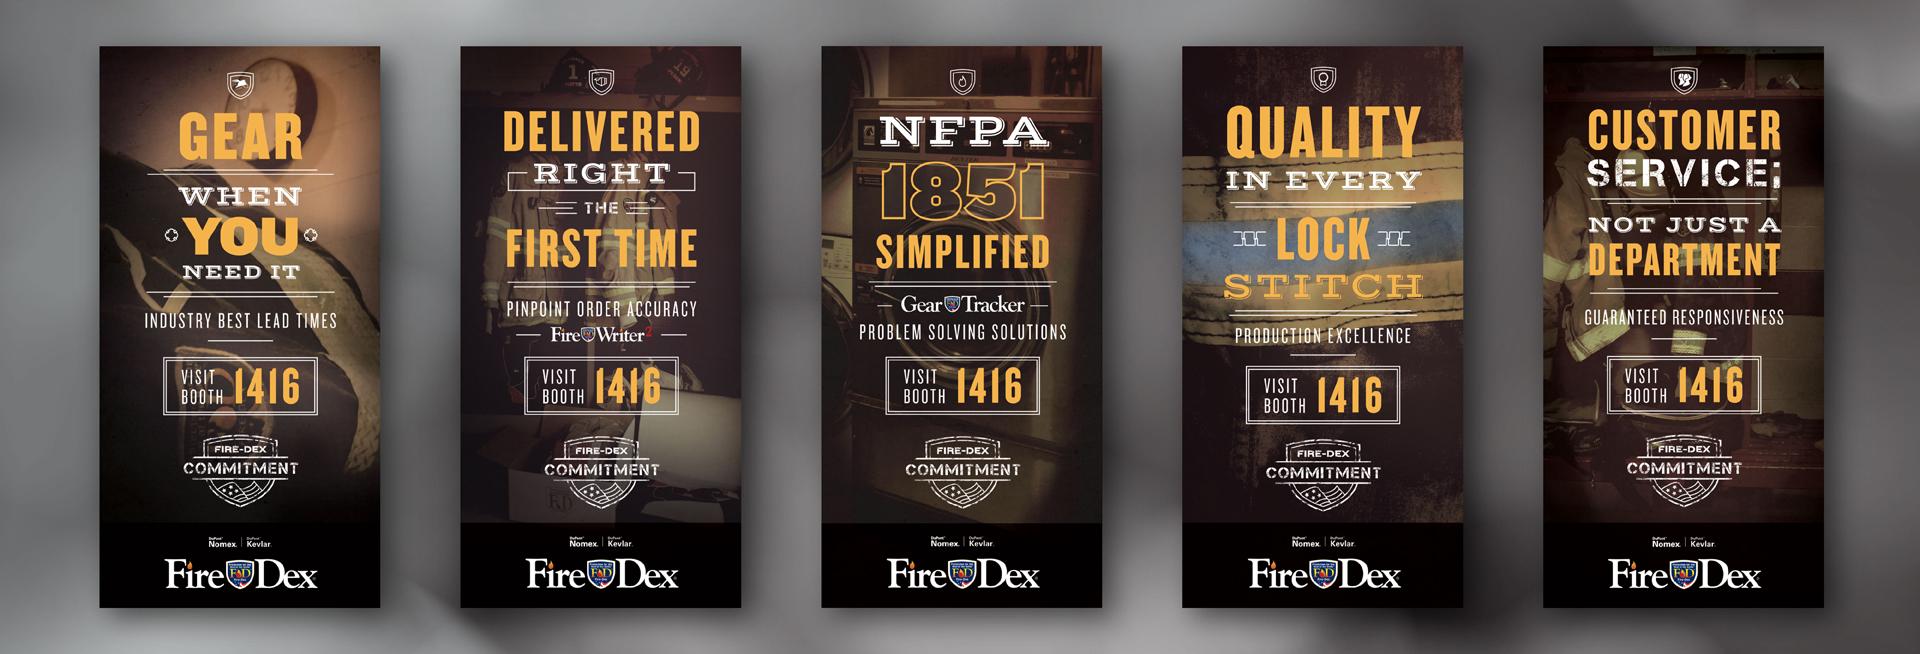 FireDex Graphic Design Posters FDIC 2015